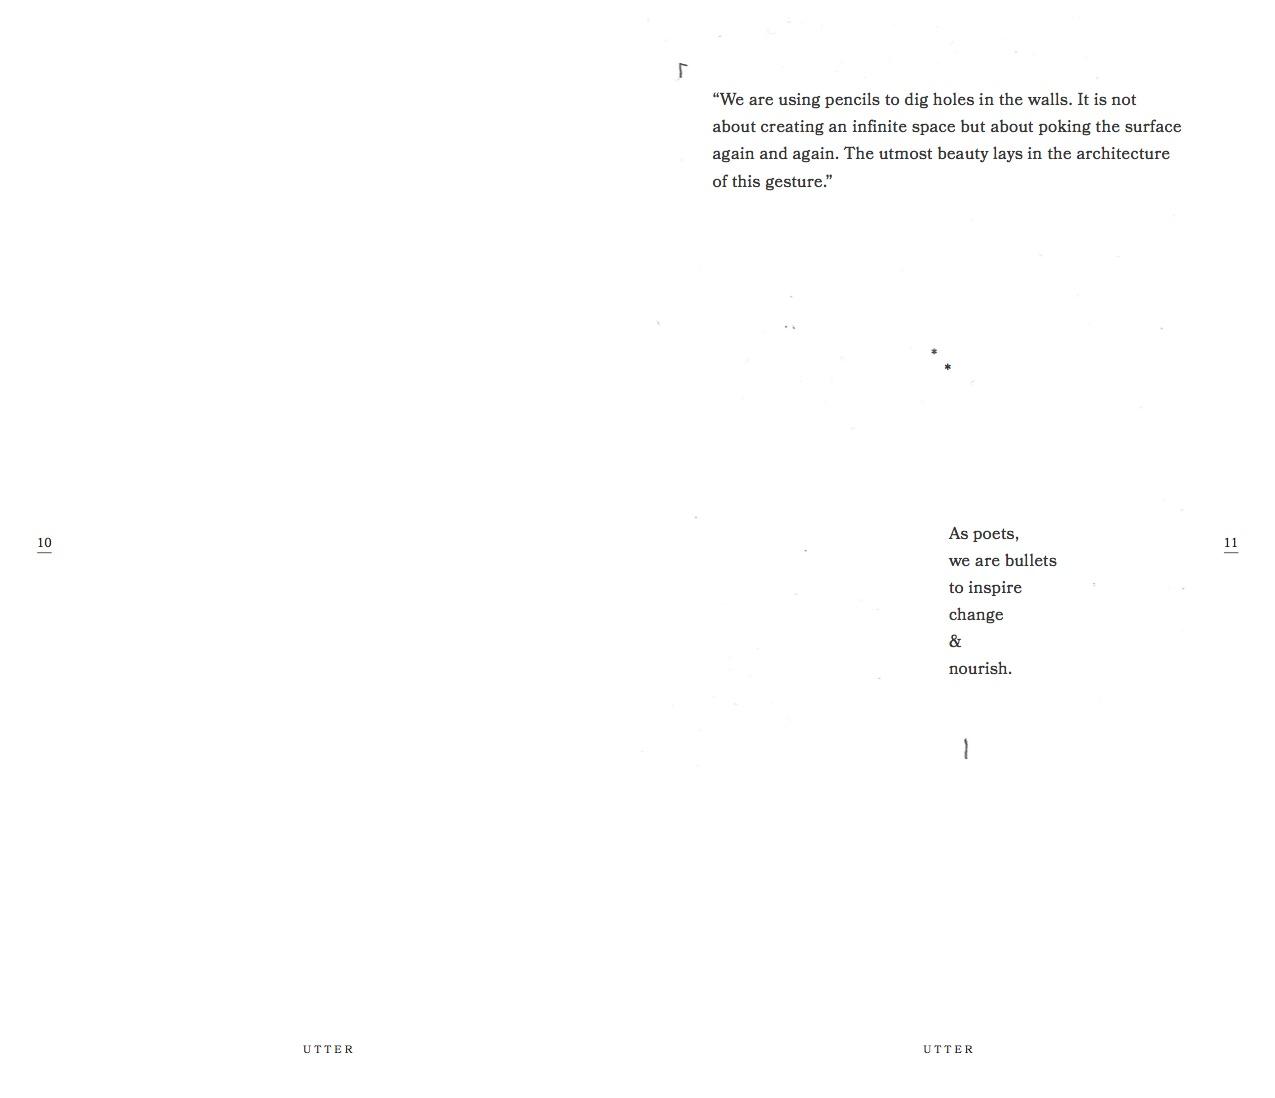 UTTER_KNJIGA_ROSA copy2.jpg